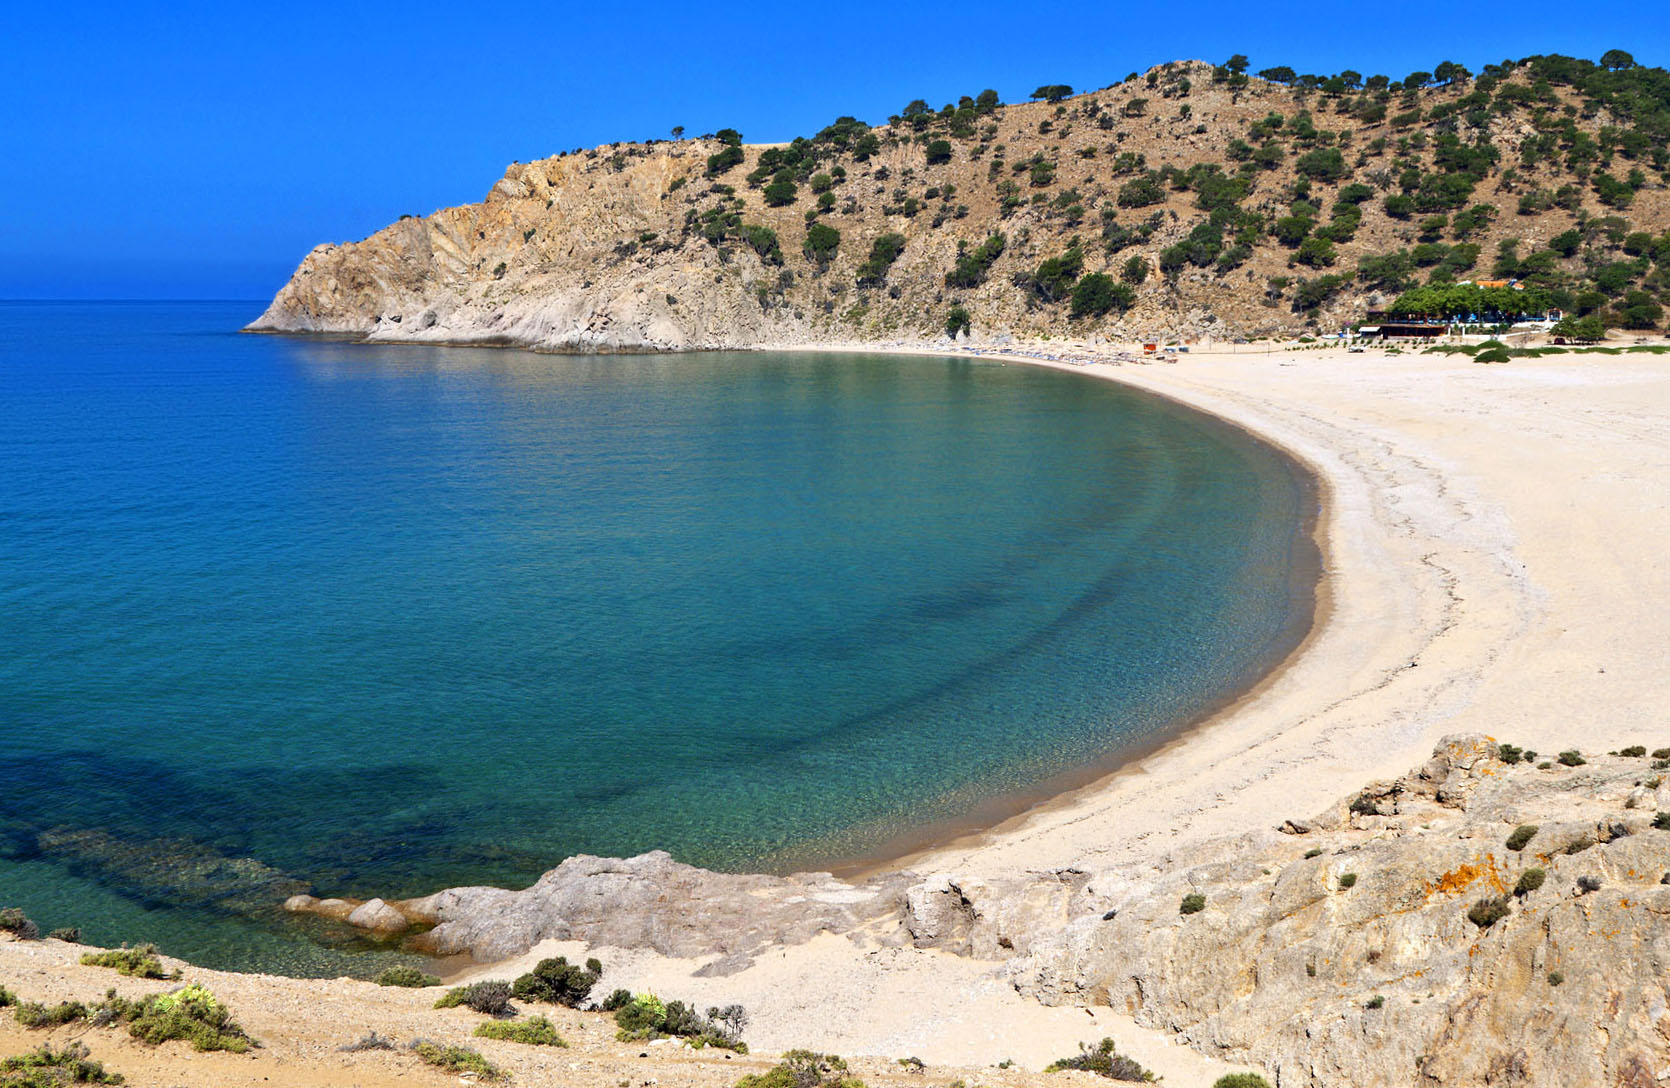 Samothraki Greece: Compare to other Greek Islands ... Daily Kos